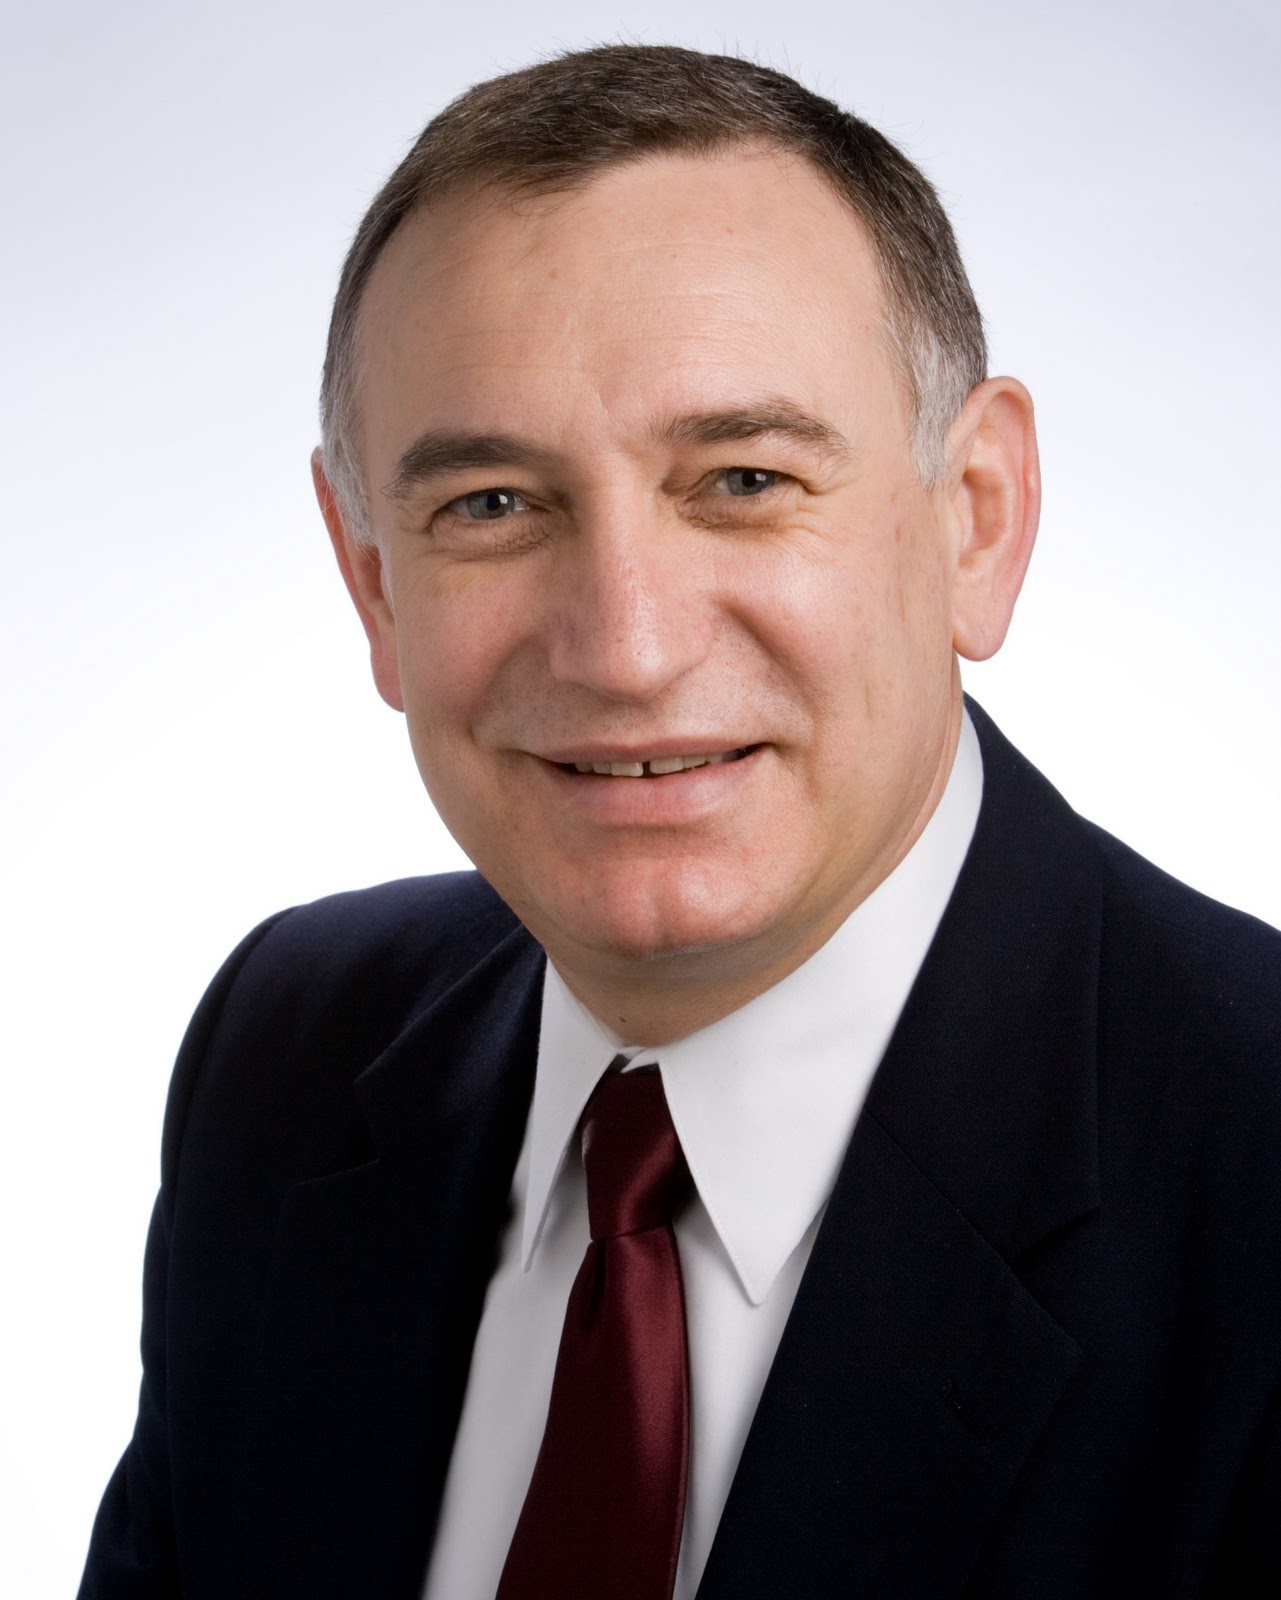 Ronald Desantis Of Yale University Named Acf Certification